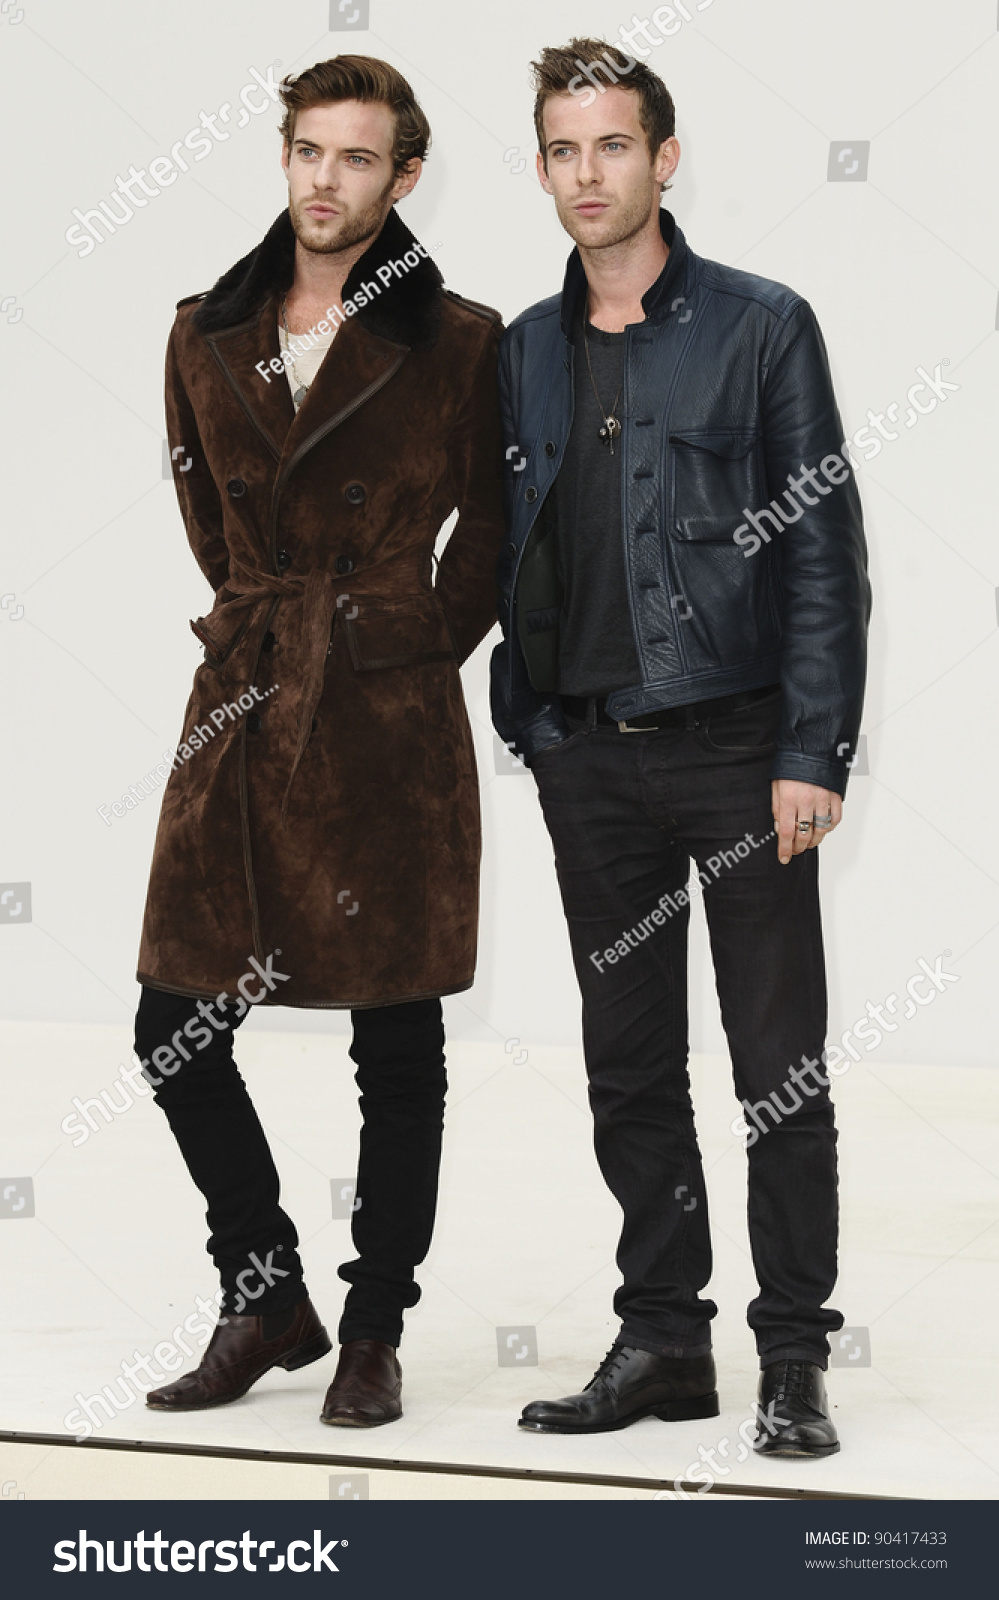 Daniel Day-Lewis (born 1957),Nikki Hahn Erotic photos Kathryn Crosby,Carmen Hart